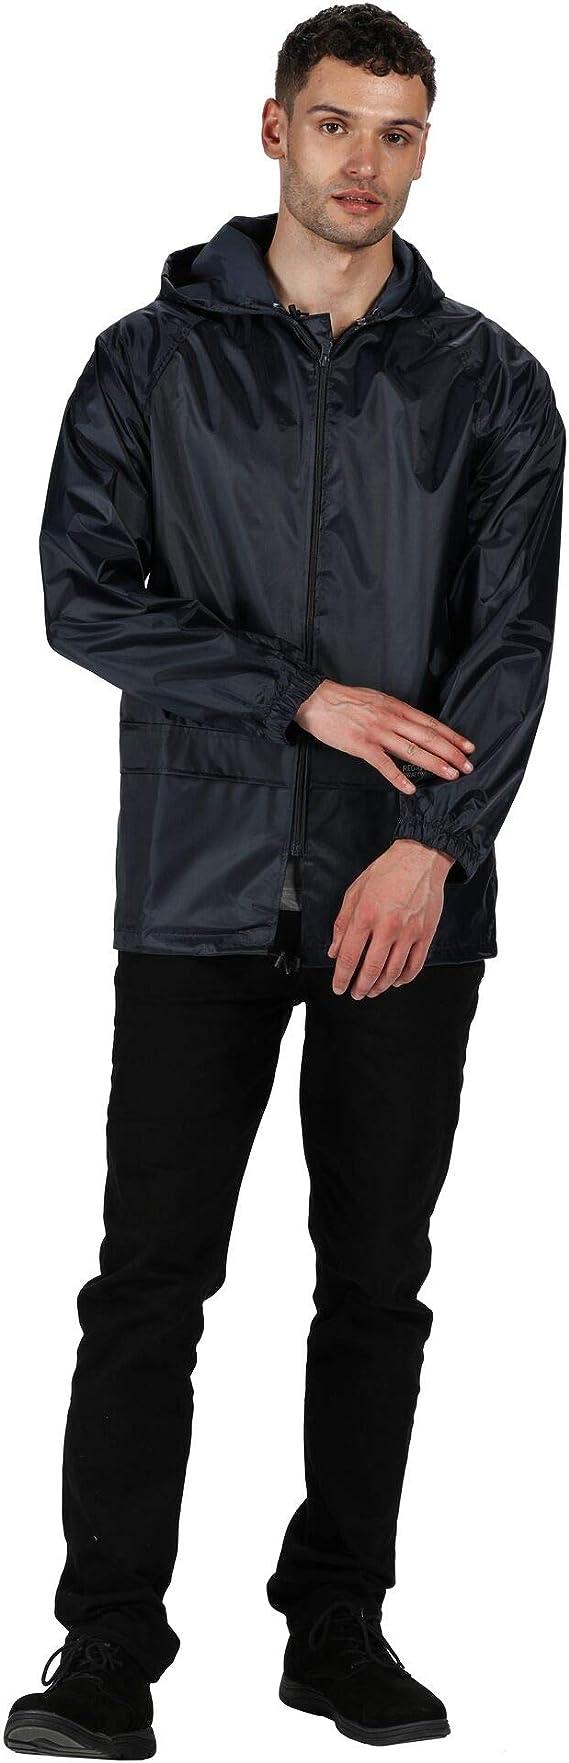 Regatta W408 Stormbreak Mens Jacket Lightweight Waterproof Windproof Work Coat